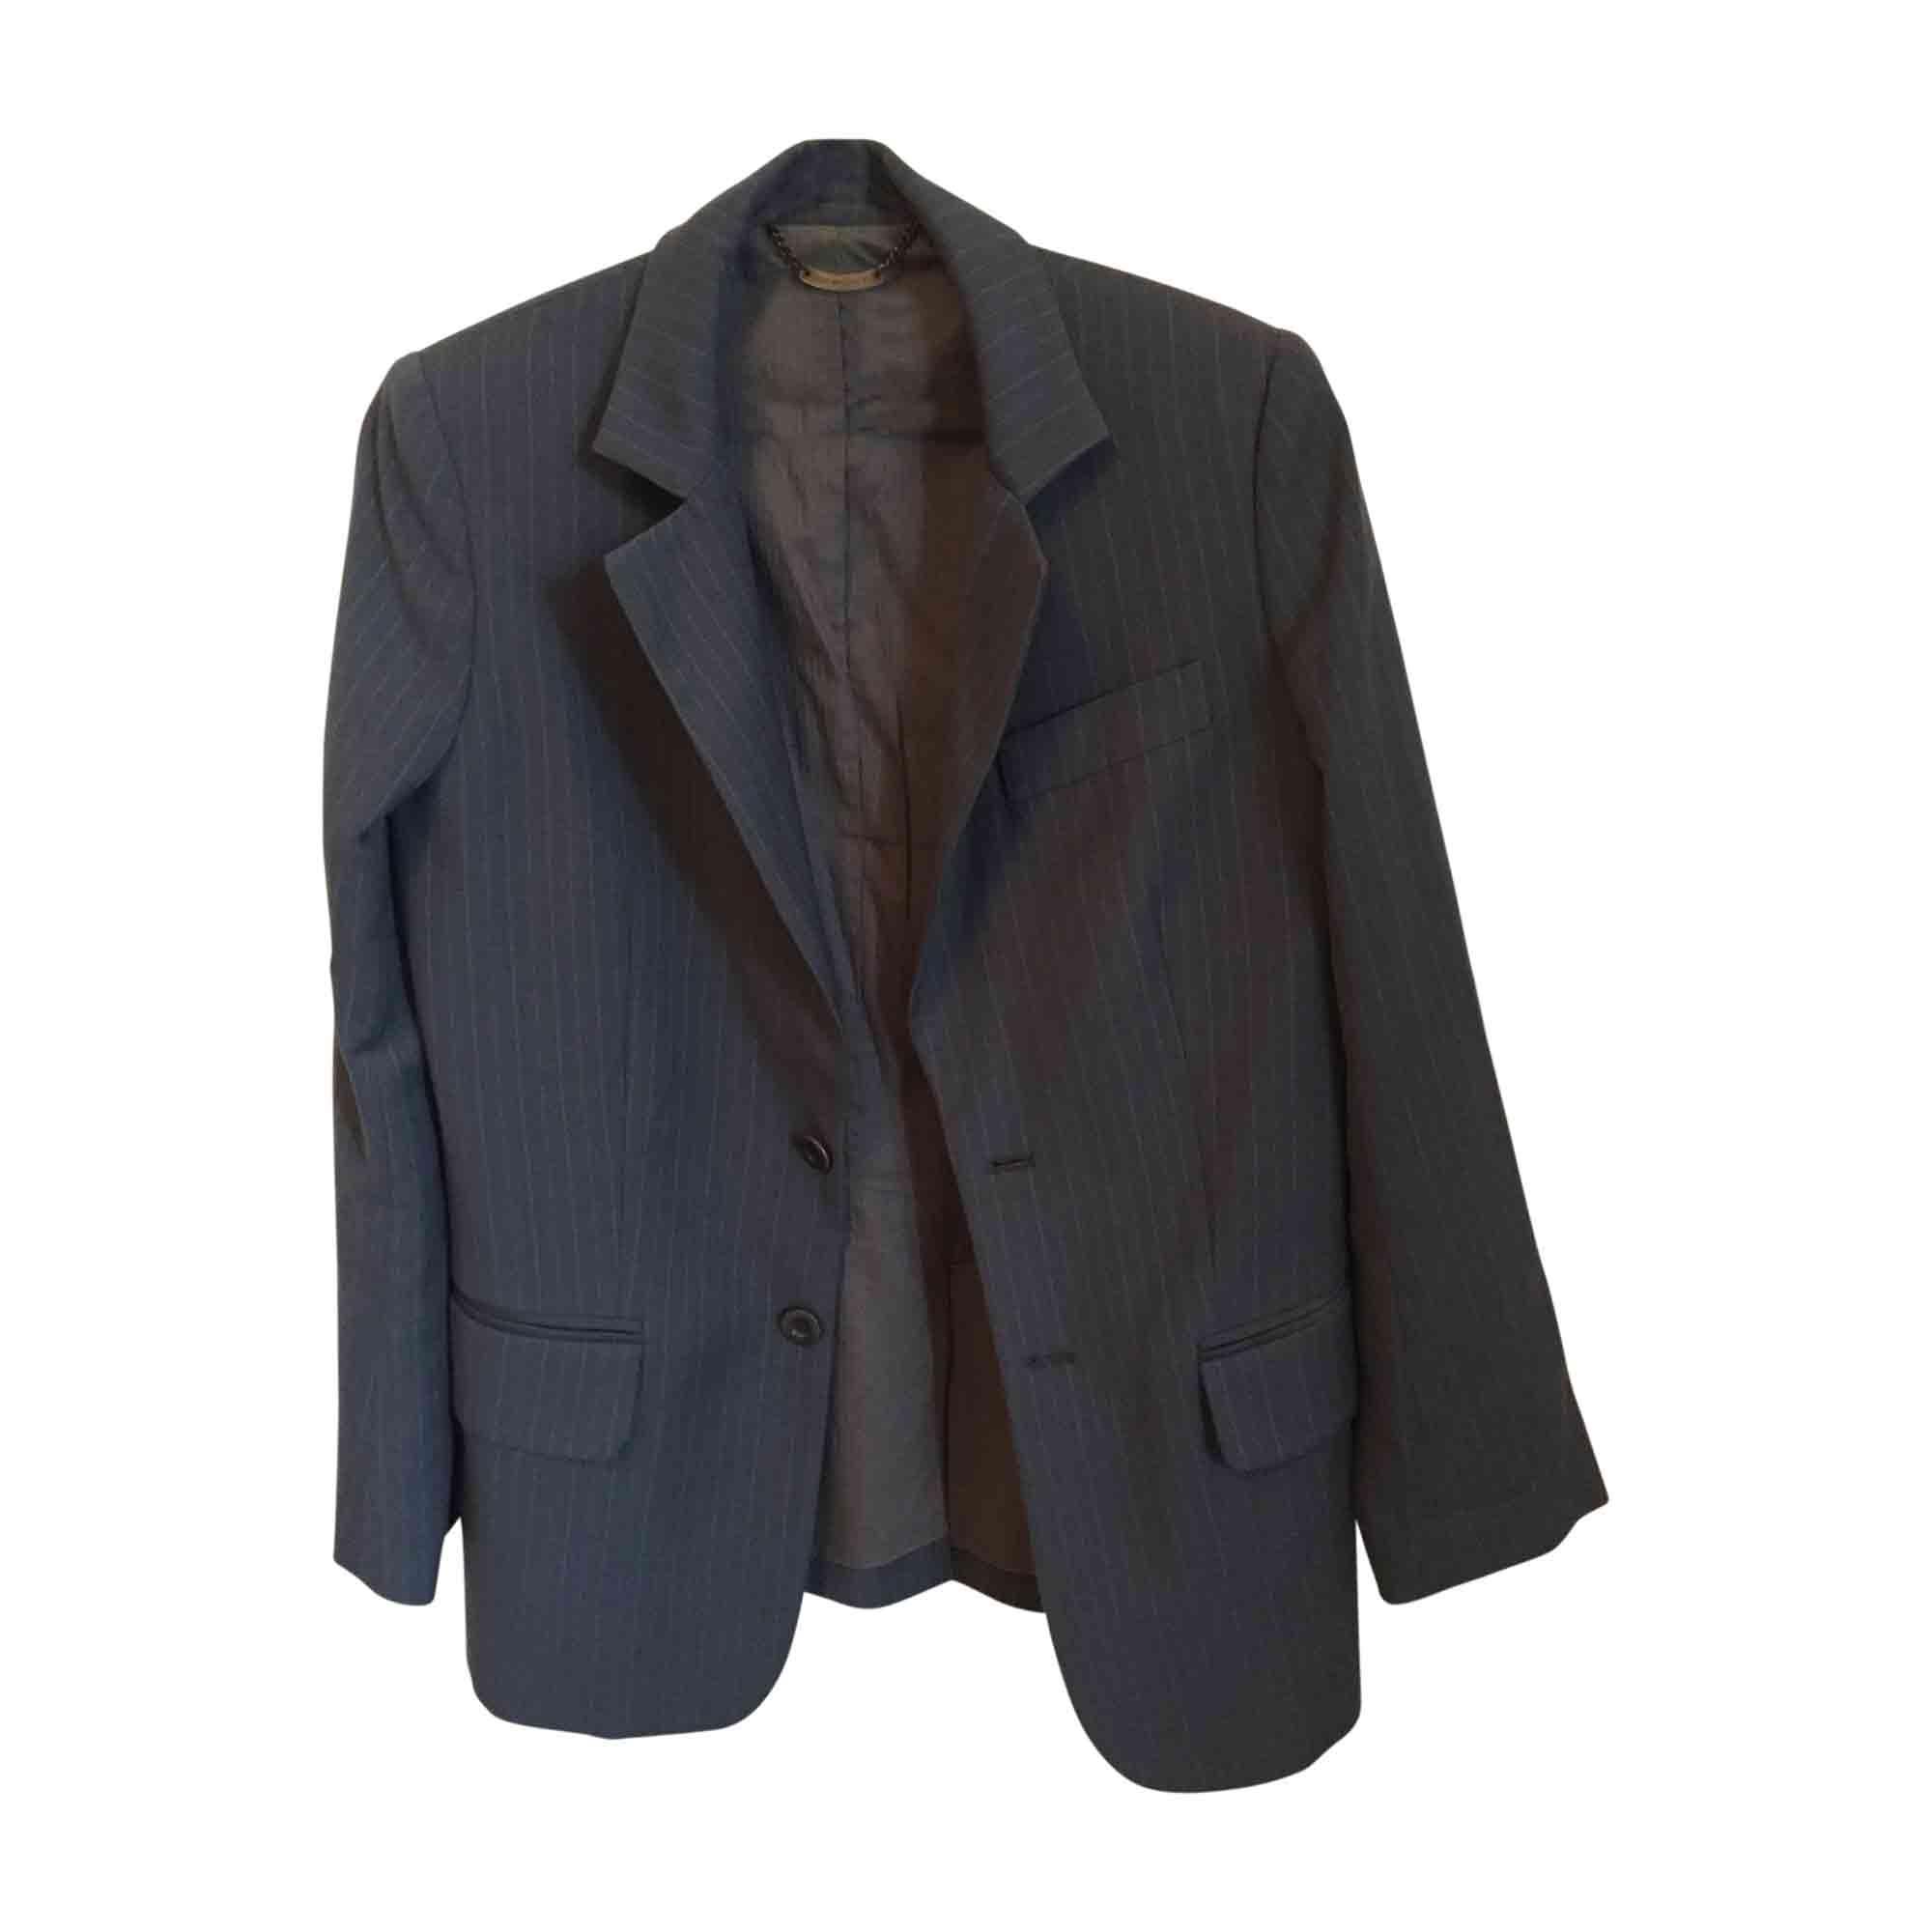 Blazer, veste tailleur SEE BY CHLOE Gris, anthracite